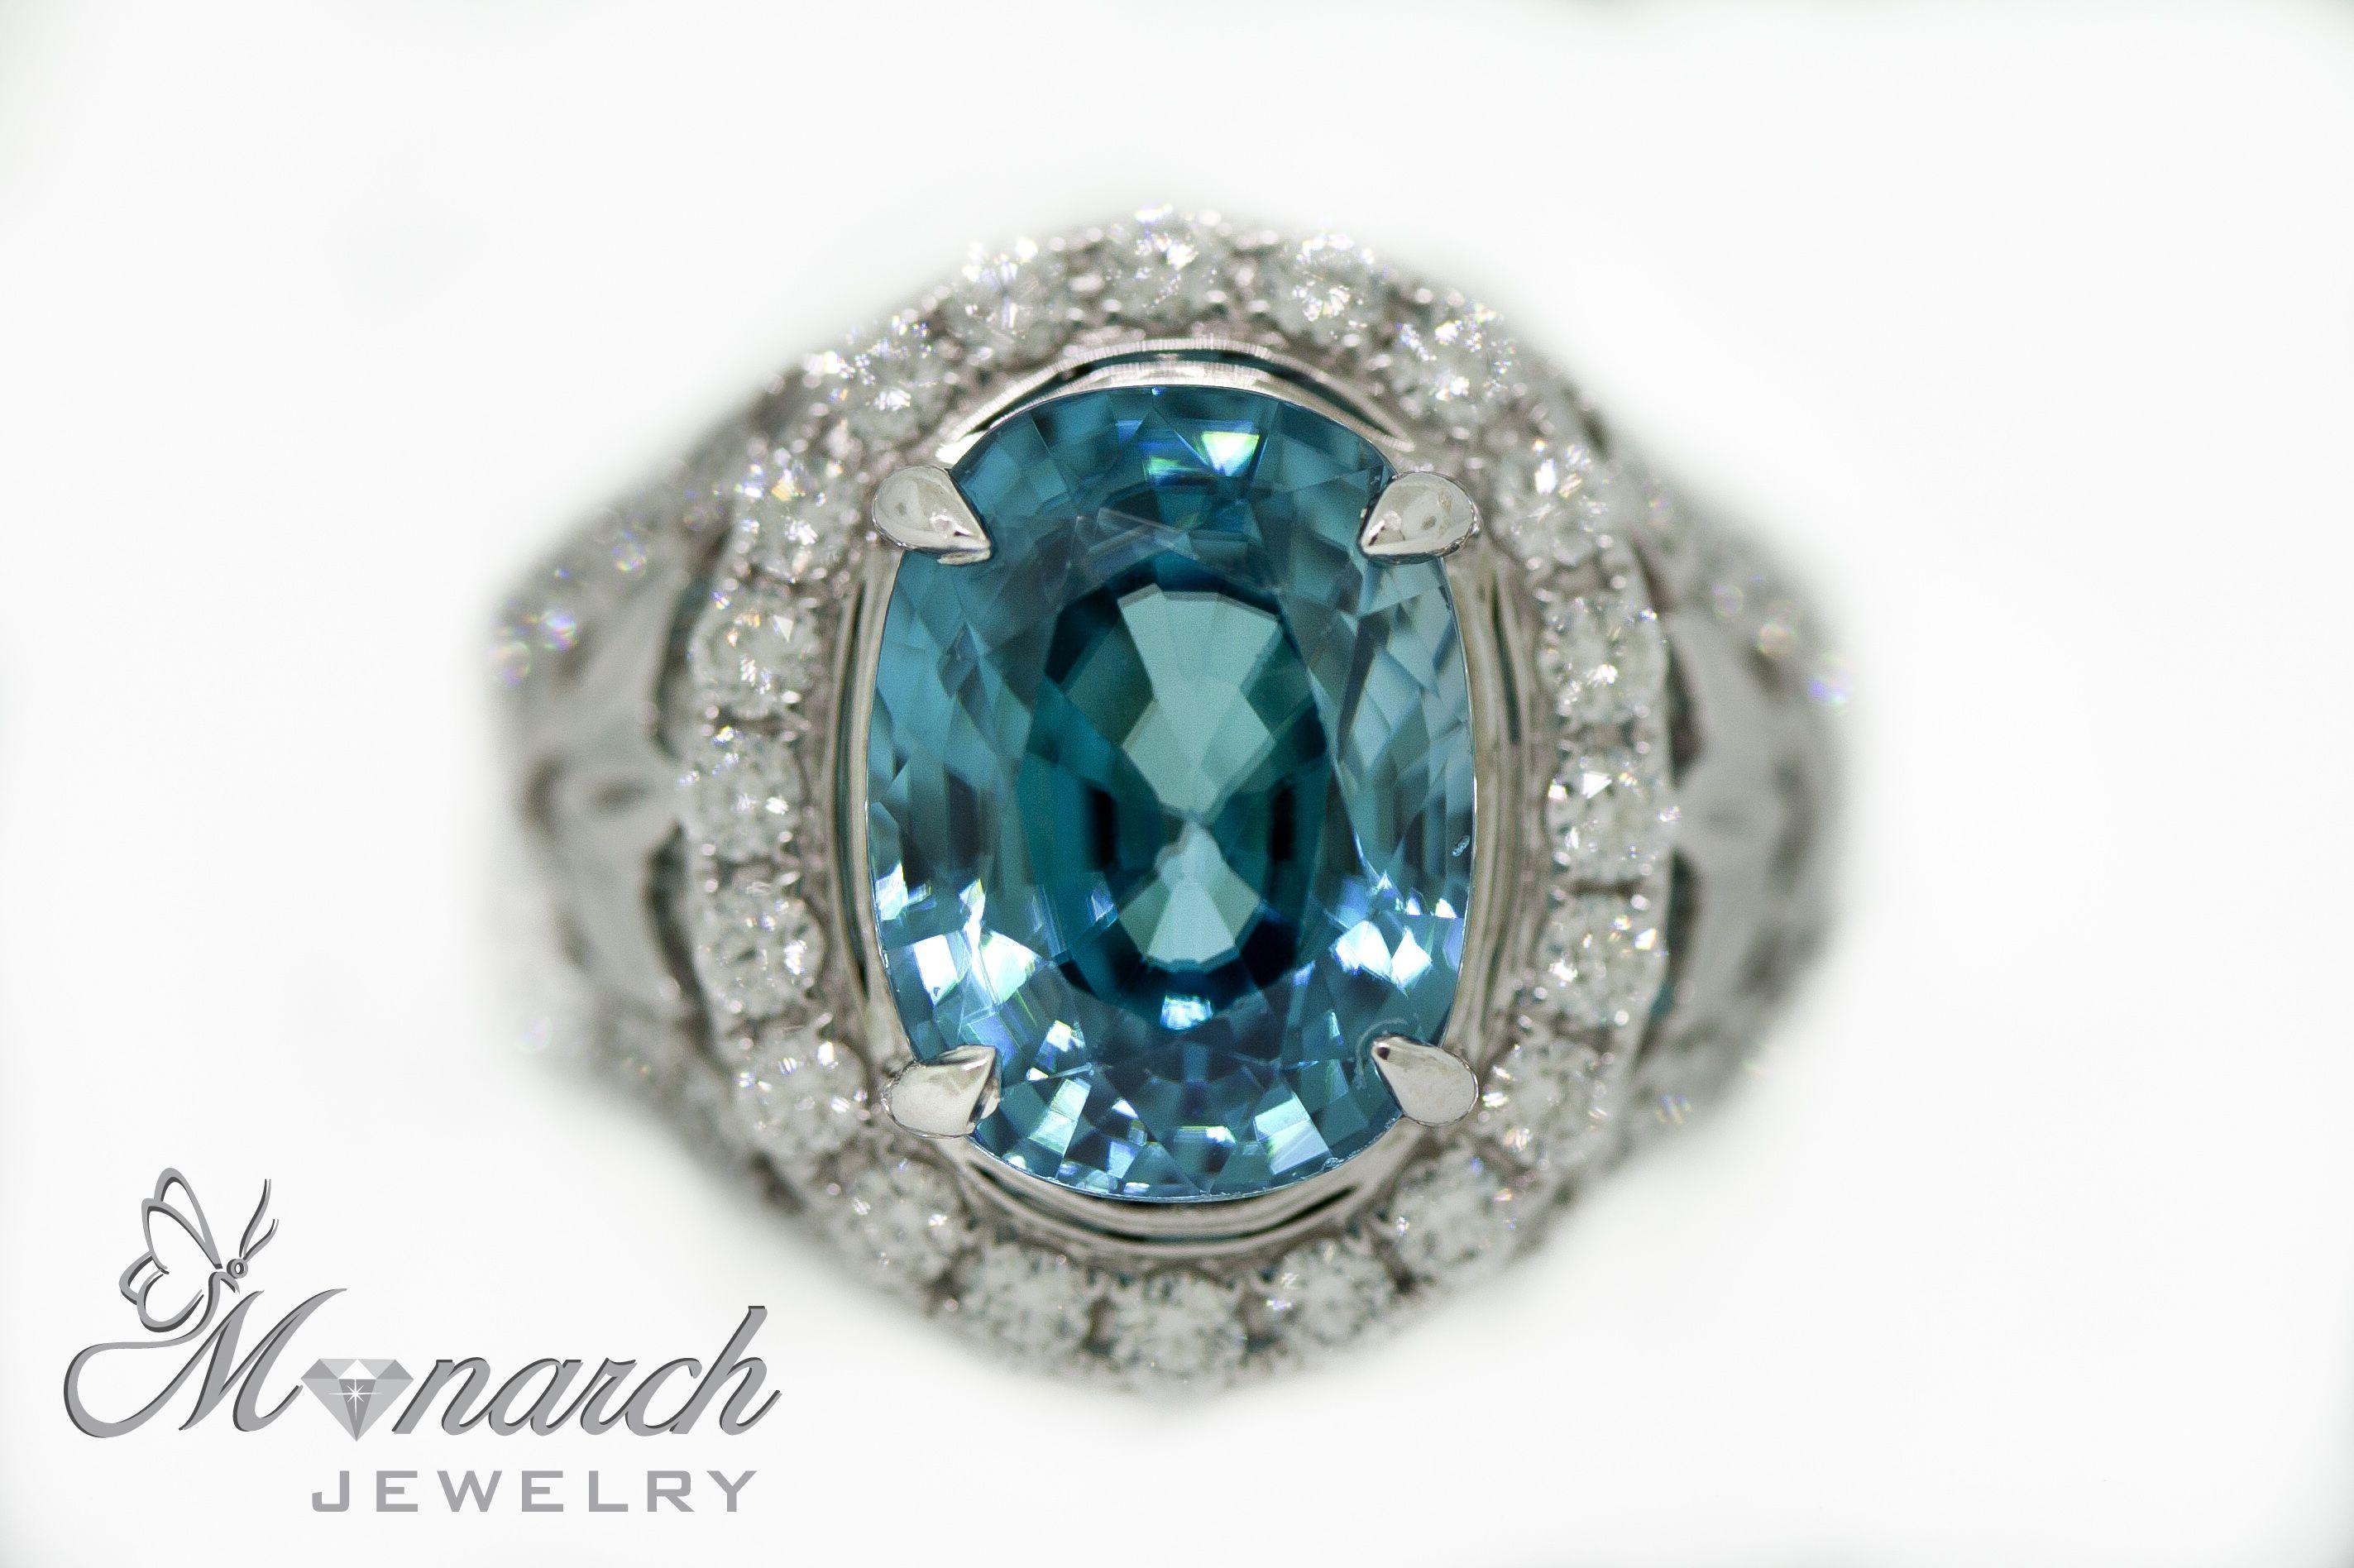 Custom Jewelry Store In Orlando Fl Monarch Jewelry Designers Monarch Jewelry Custom Jewelry Design Jewelry